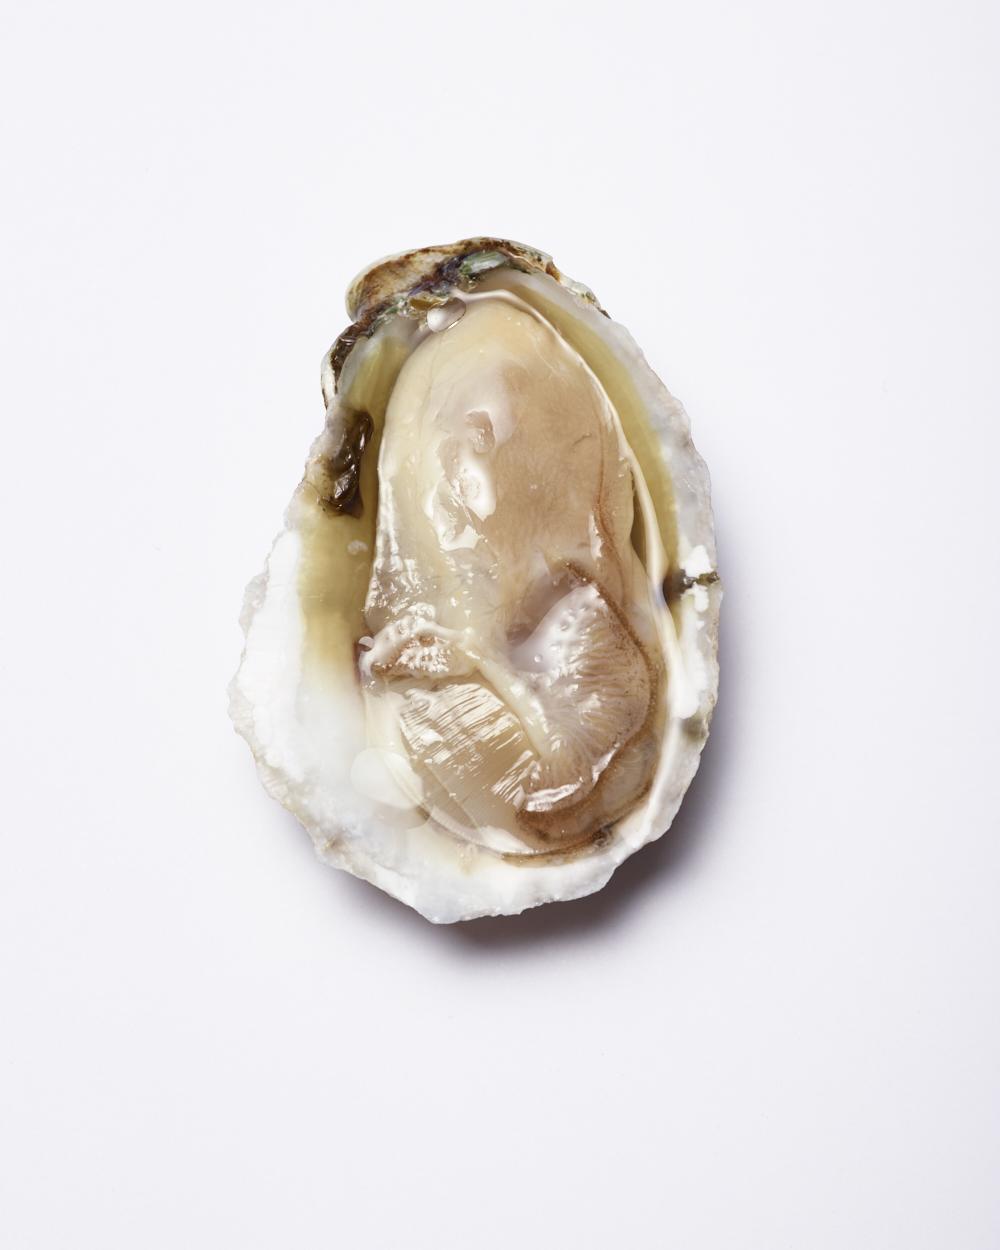 Bon Appetit 'Whitestone Oyster'